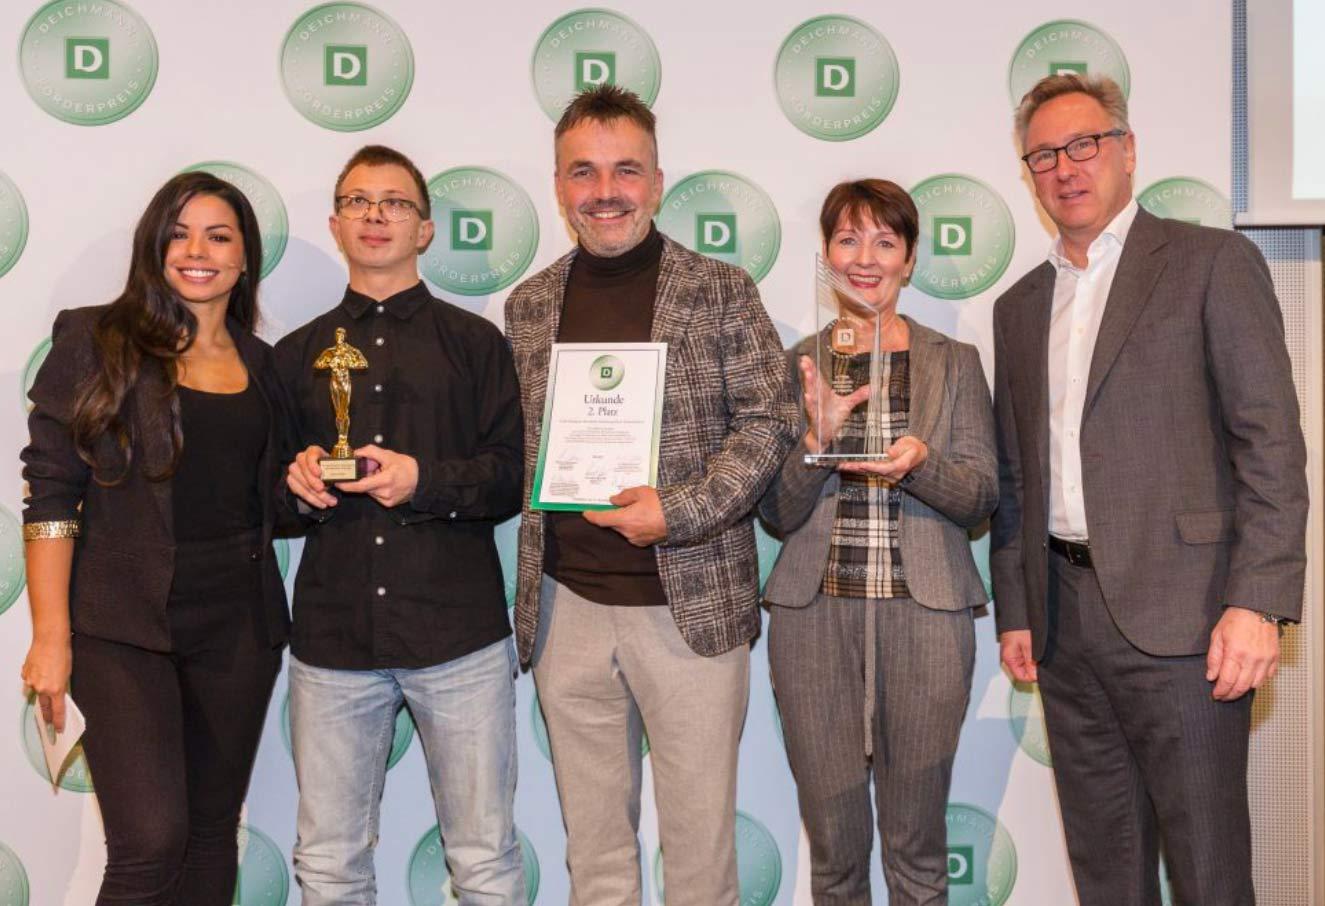 DEICHMANN-Förderpreis für Integration an Bäckerei Schmidt Karlsruhe